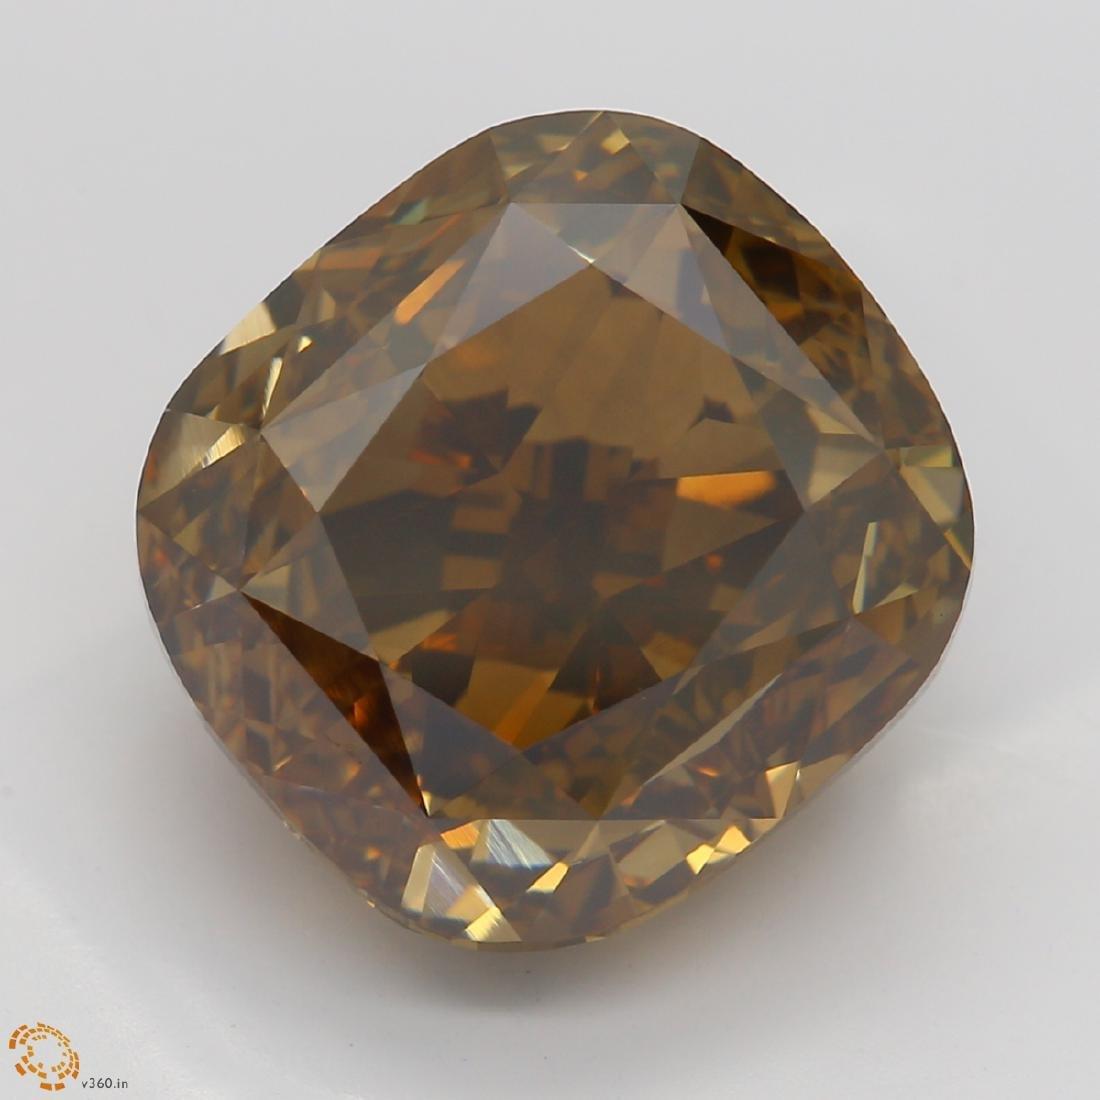 8.08 ct, Yellow Brown/VS1, Cushion cut Diamond